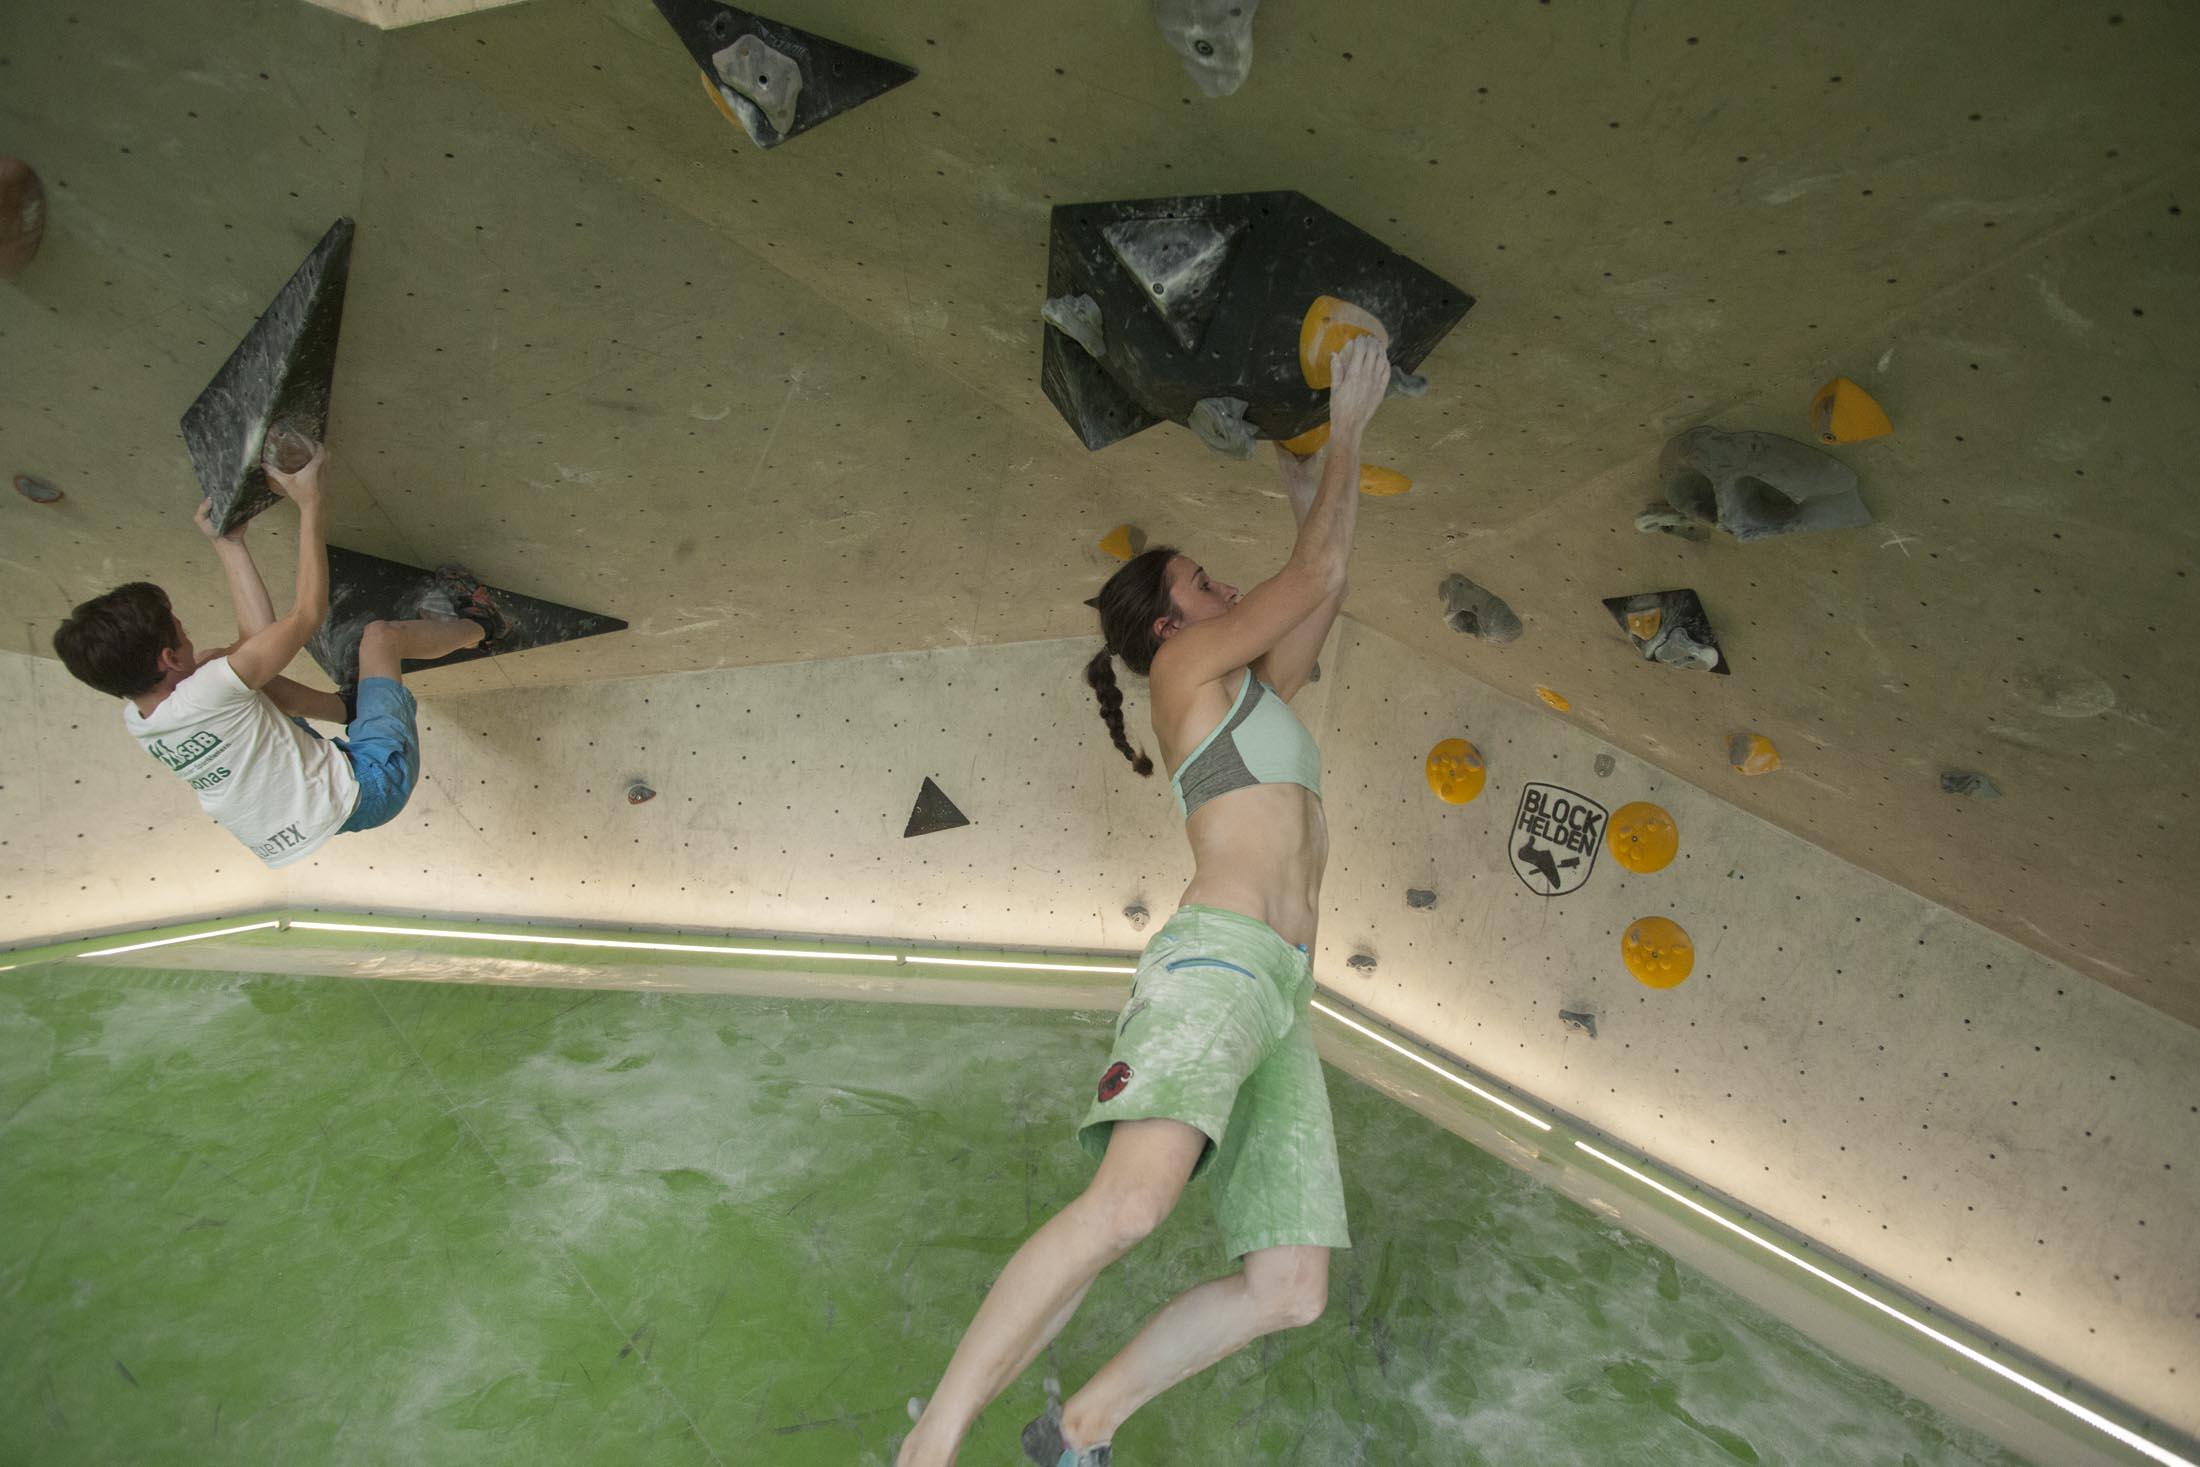 Juliane Wurm, internationaler bouldercup Frankenjura, BLOCKHELDEN Erlangen, Bergfreunde.de, Mammut07092016035